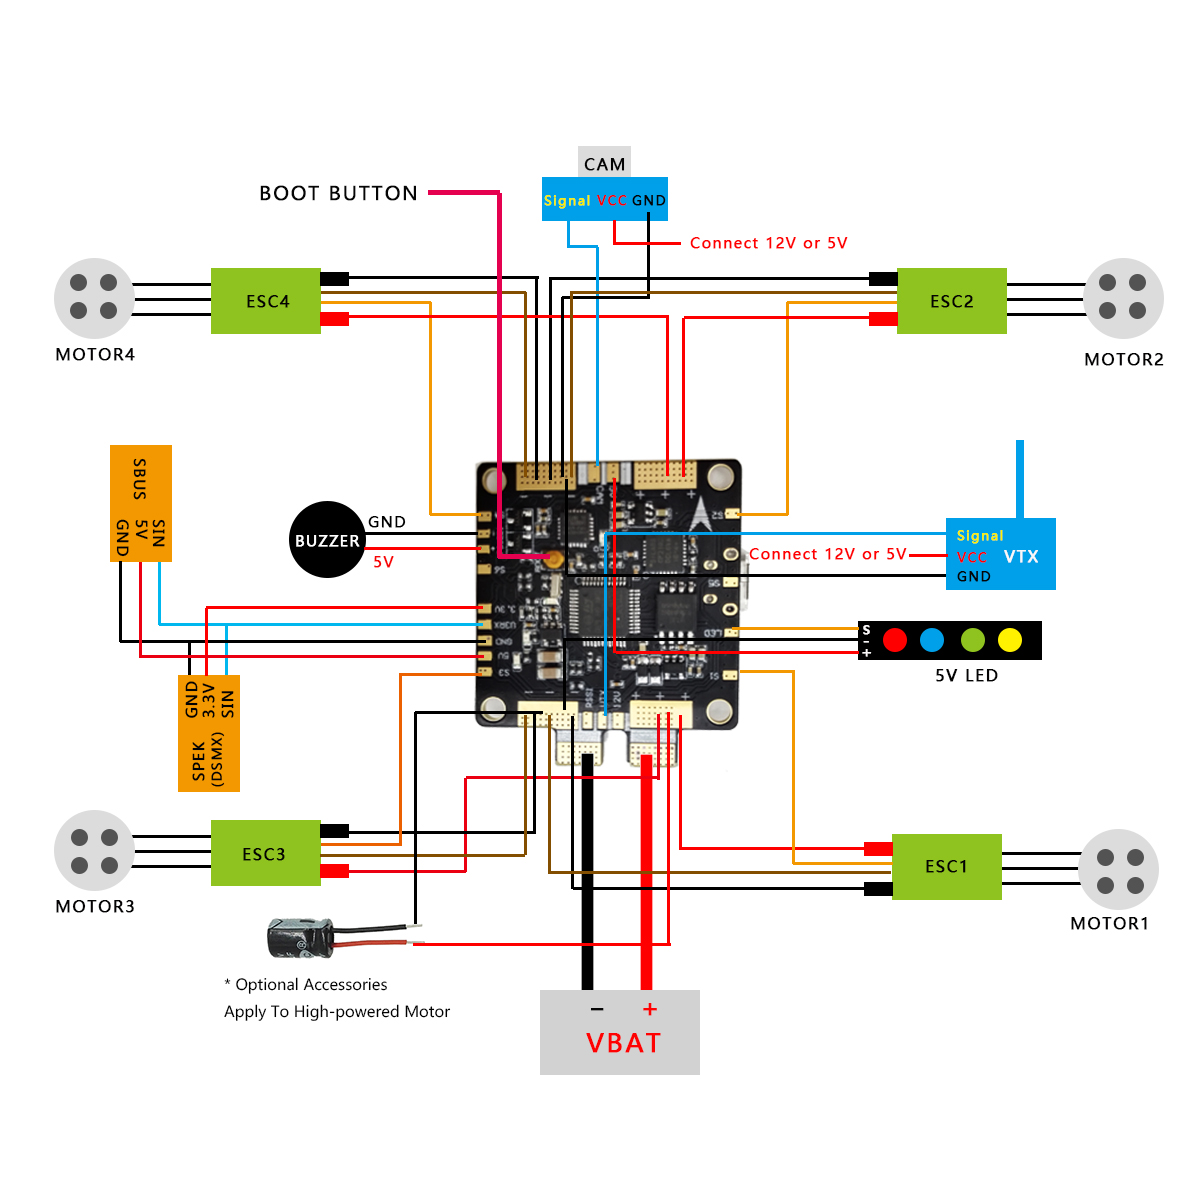 Hd wallpapers quadcopter esc wiring diagram 83dwall2 get free high quality hd wallpapers quadcopter esc wiring diagram asfbconference2016 Choice Image